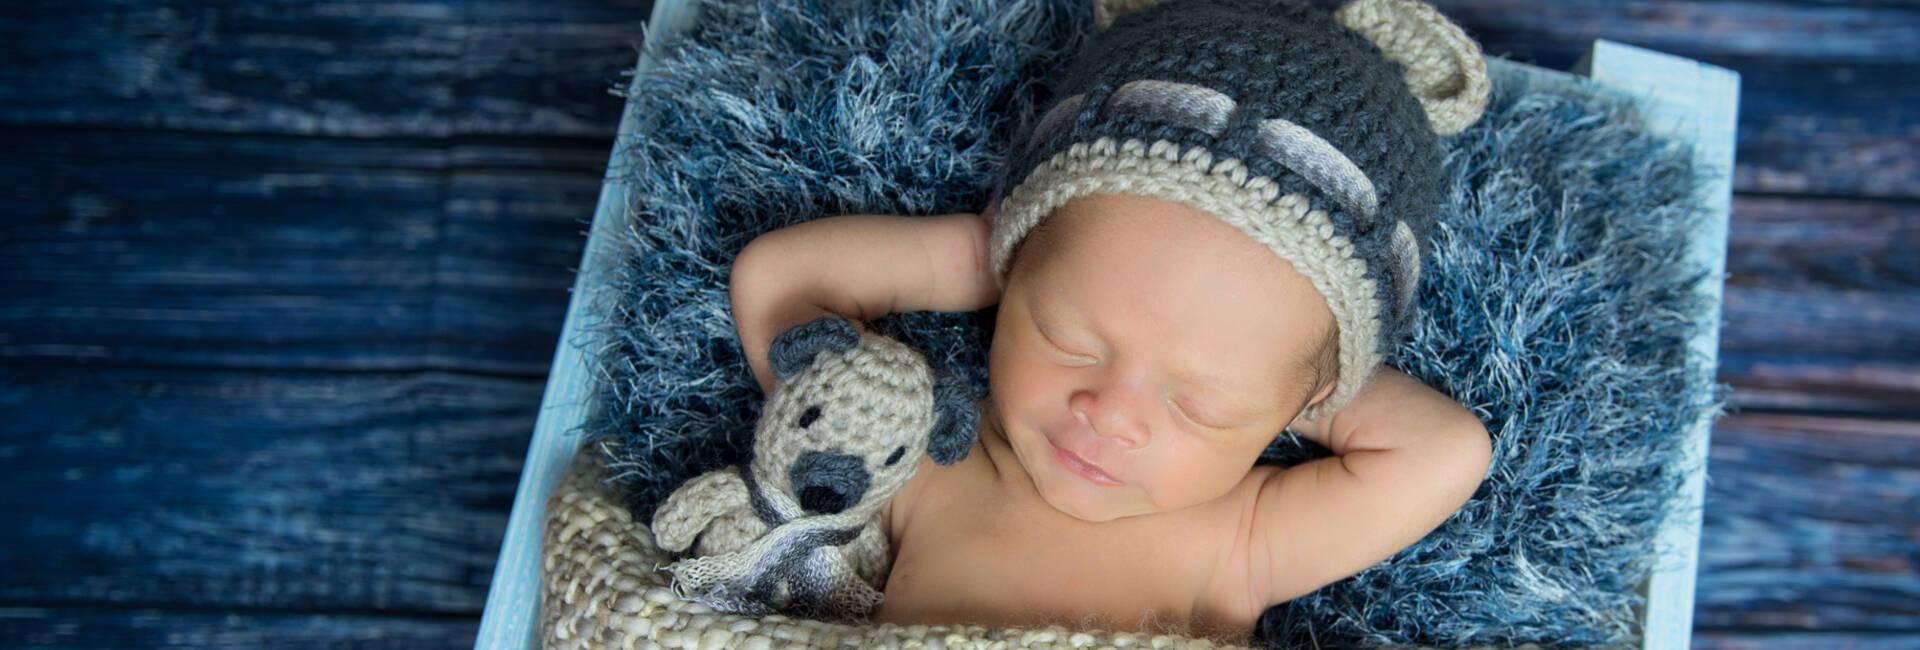 Newborn de Nicollas